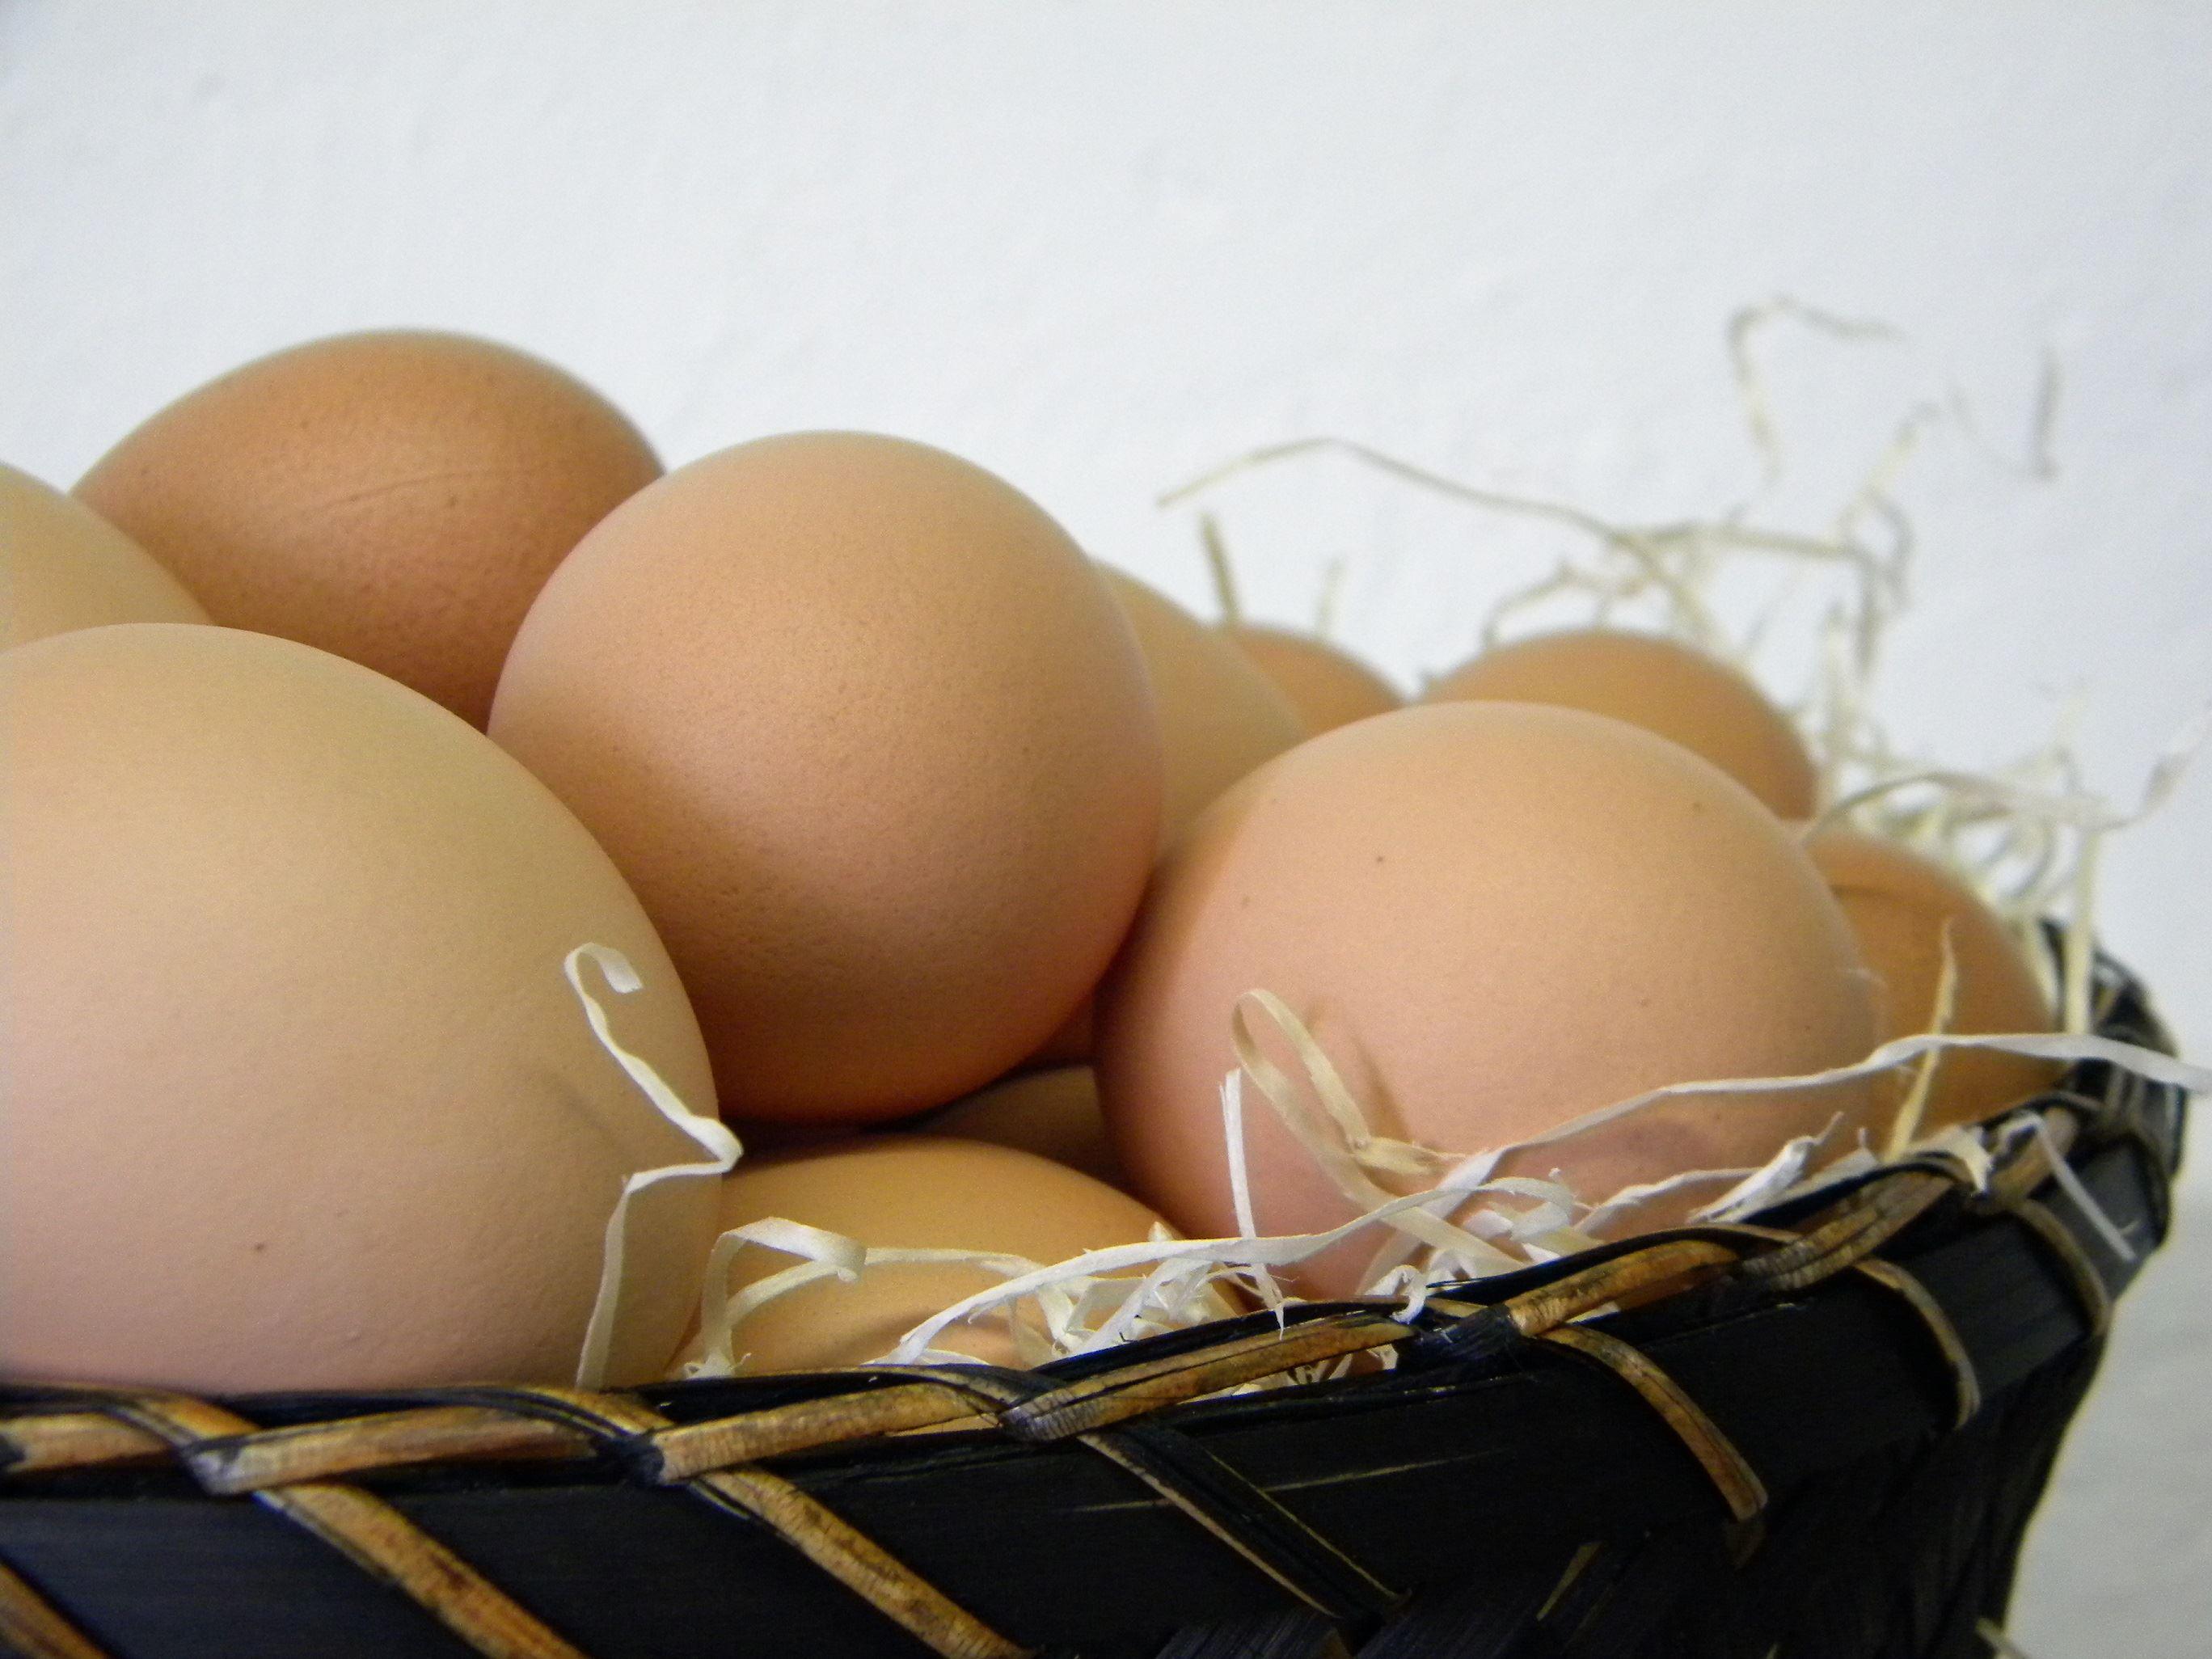 Ägg, Skåne, Gårdsbutik